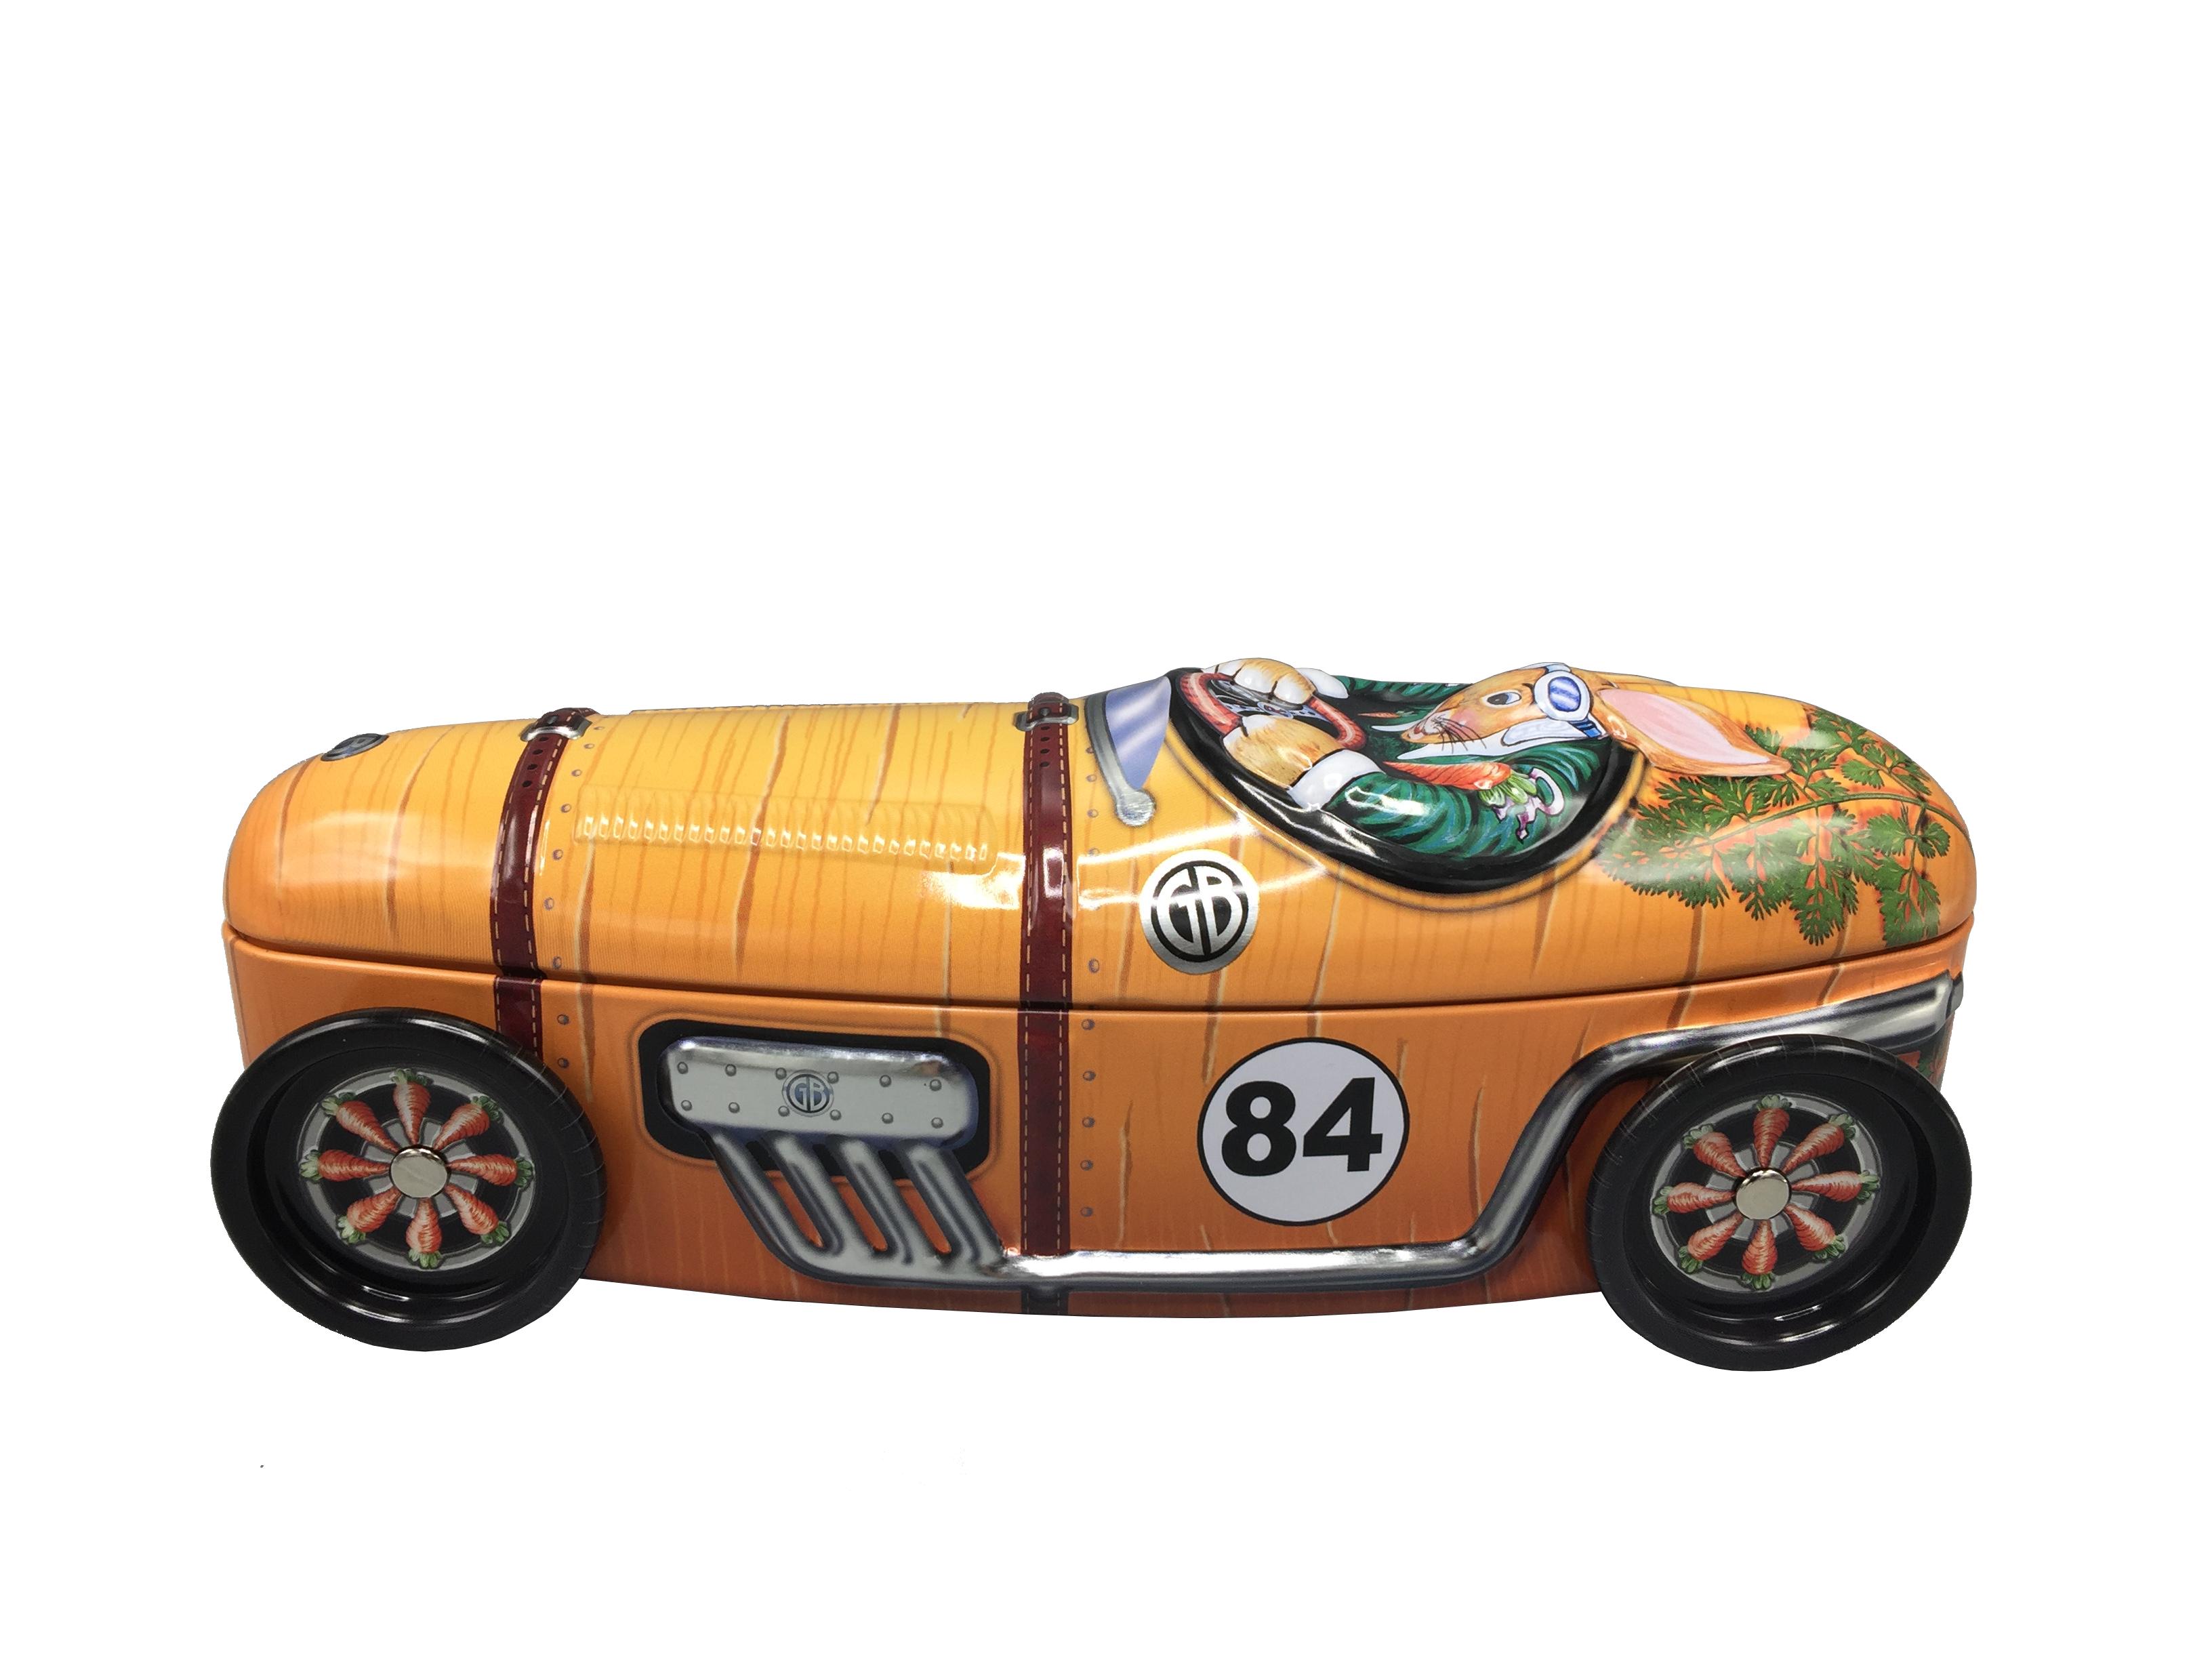 10018 Karotten-Renner